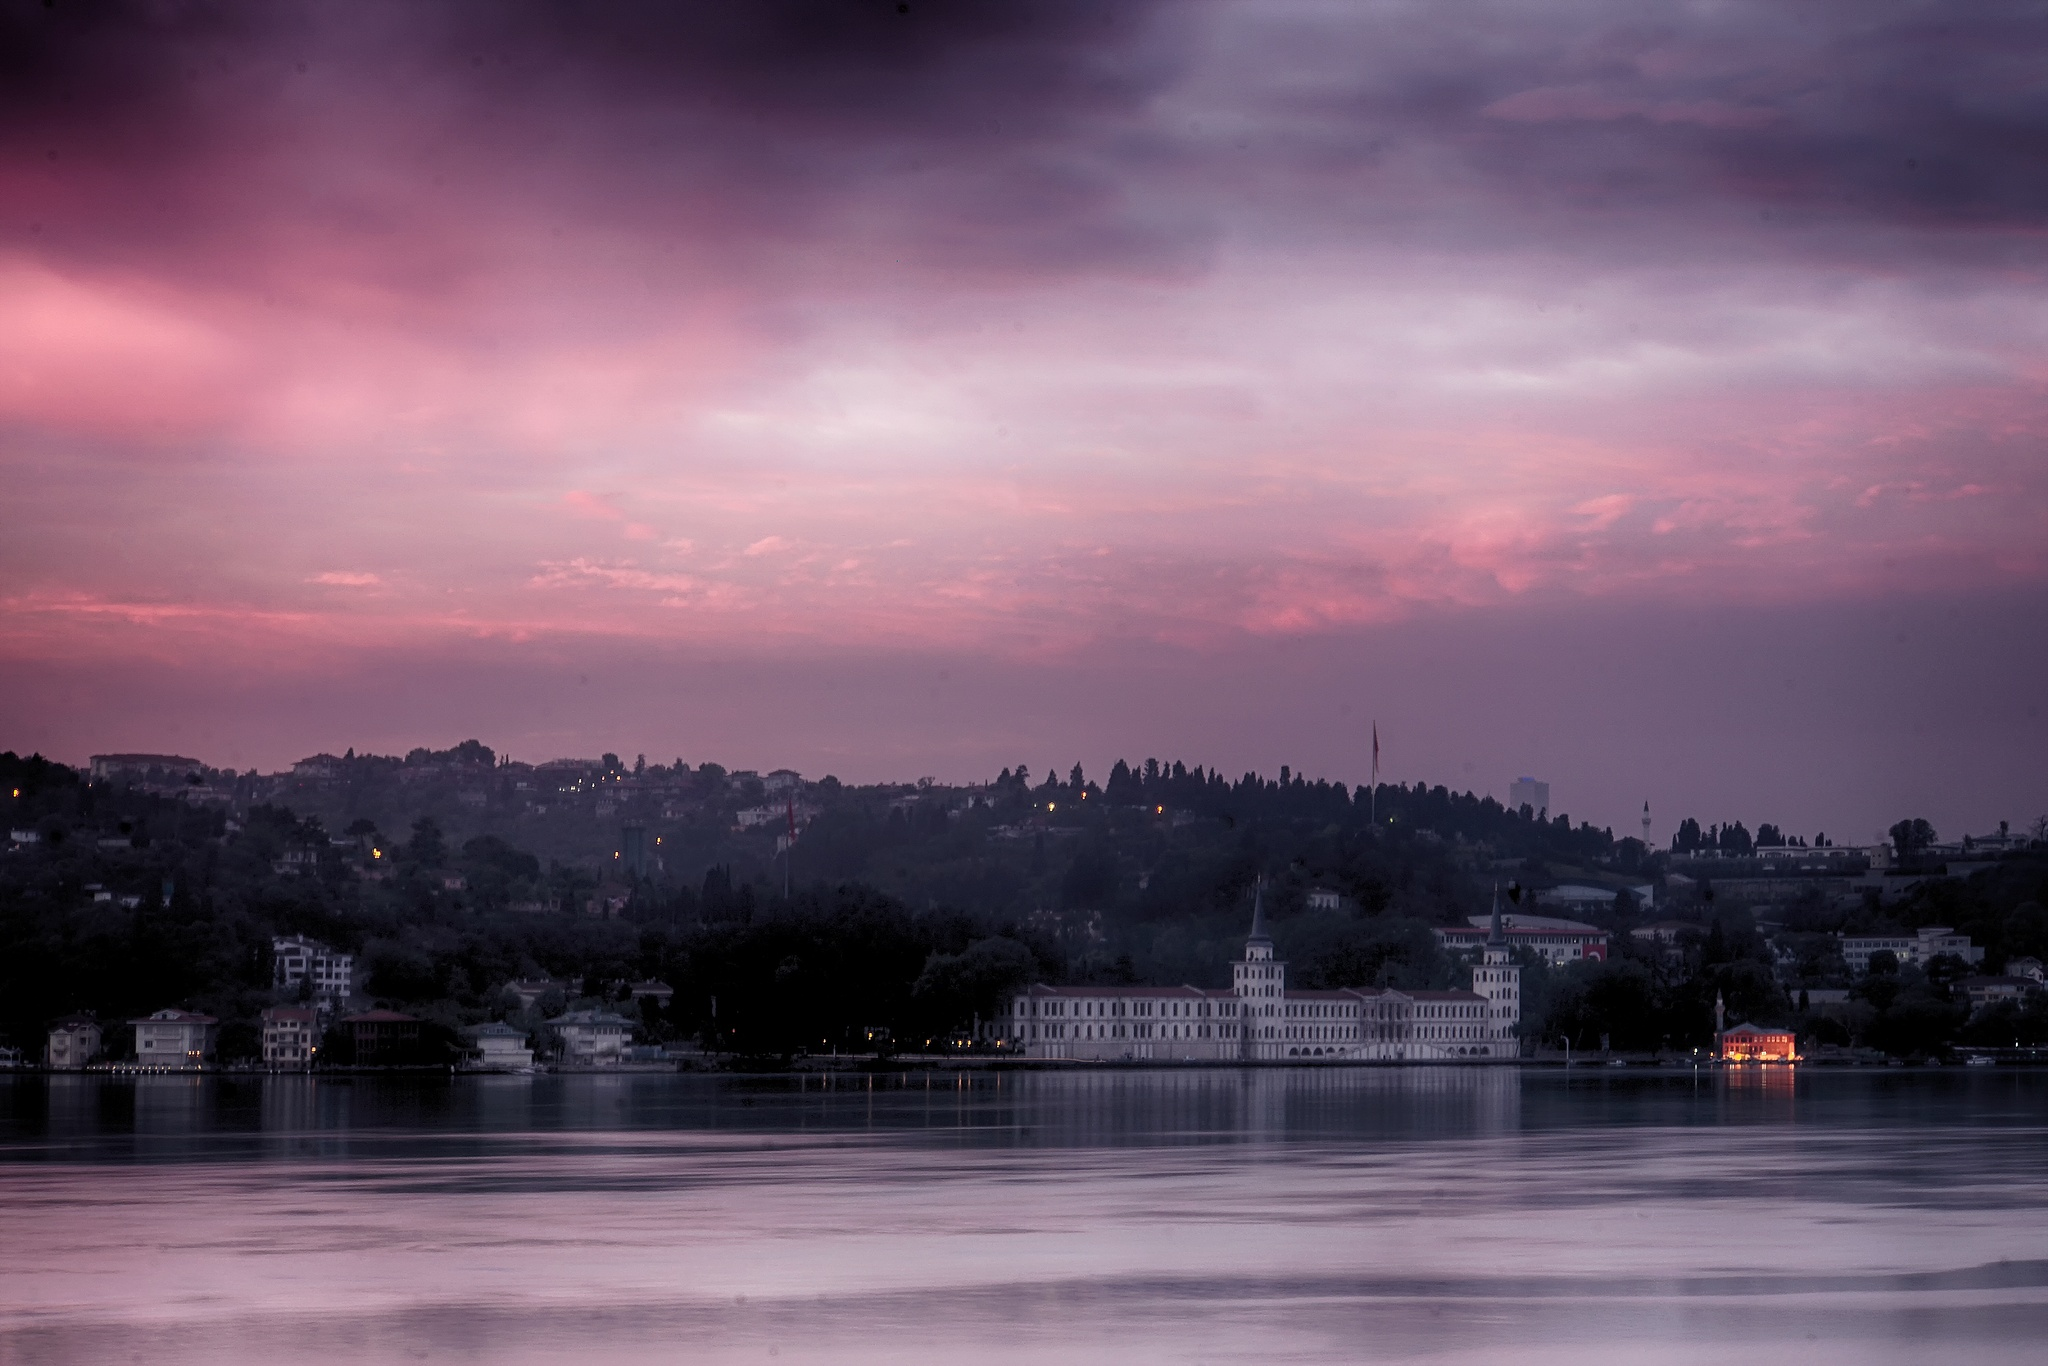 dawn in the city by Kader Eryavuz